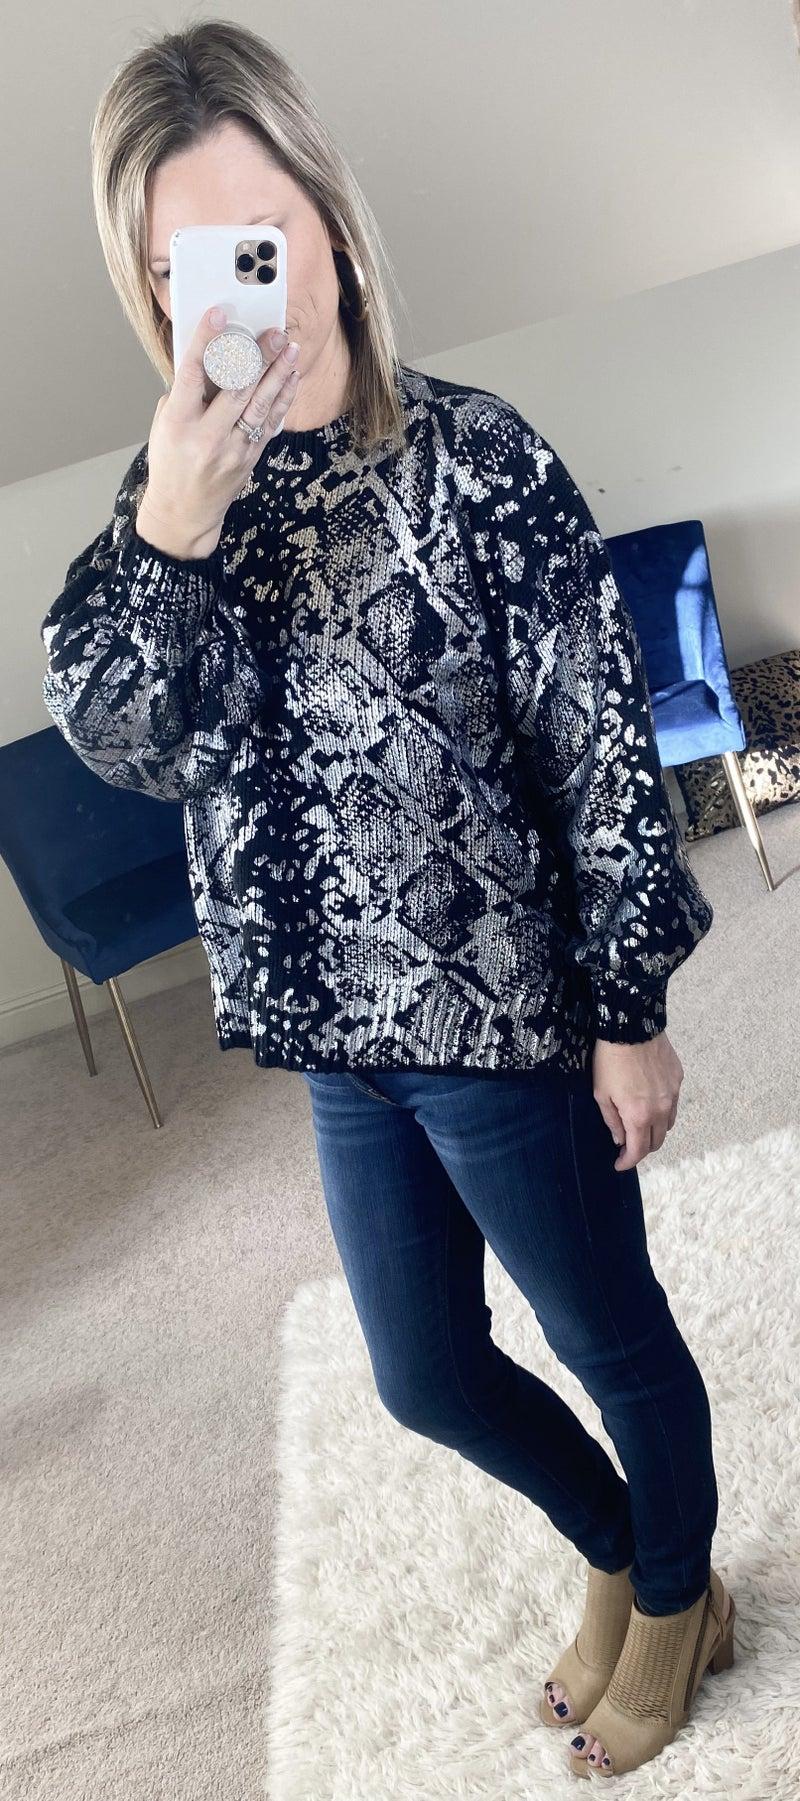 Animal Printed Sweater with Metallic Design